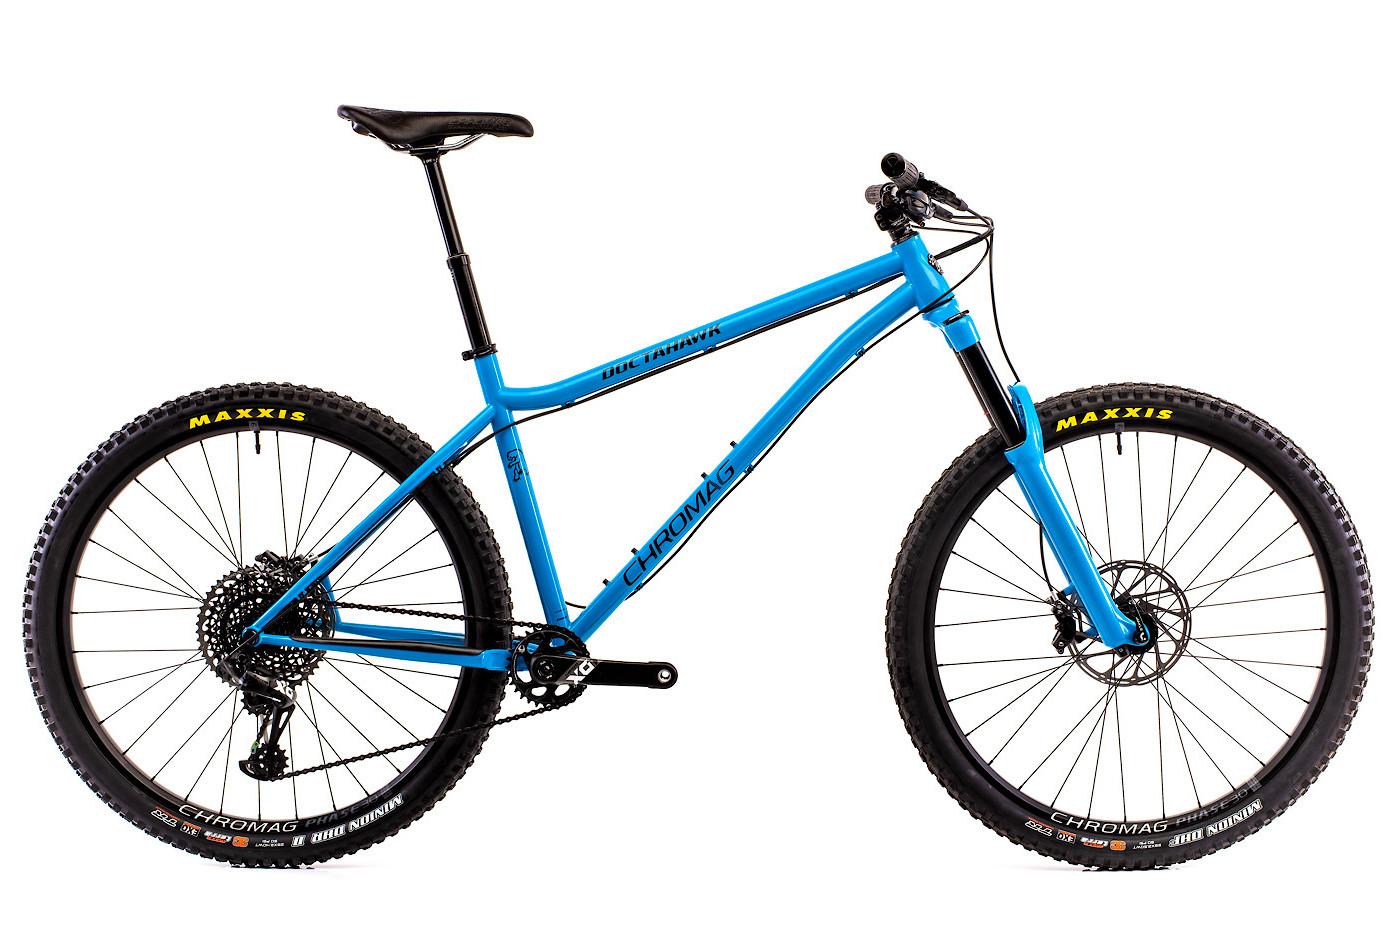 2019 Chromag Doctahawk GX Eagle Build Bike